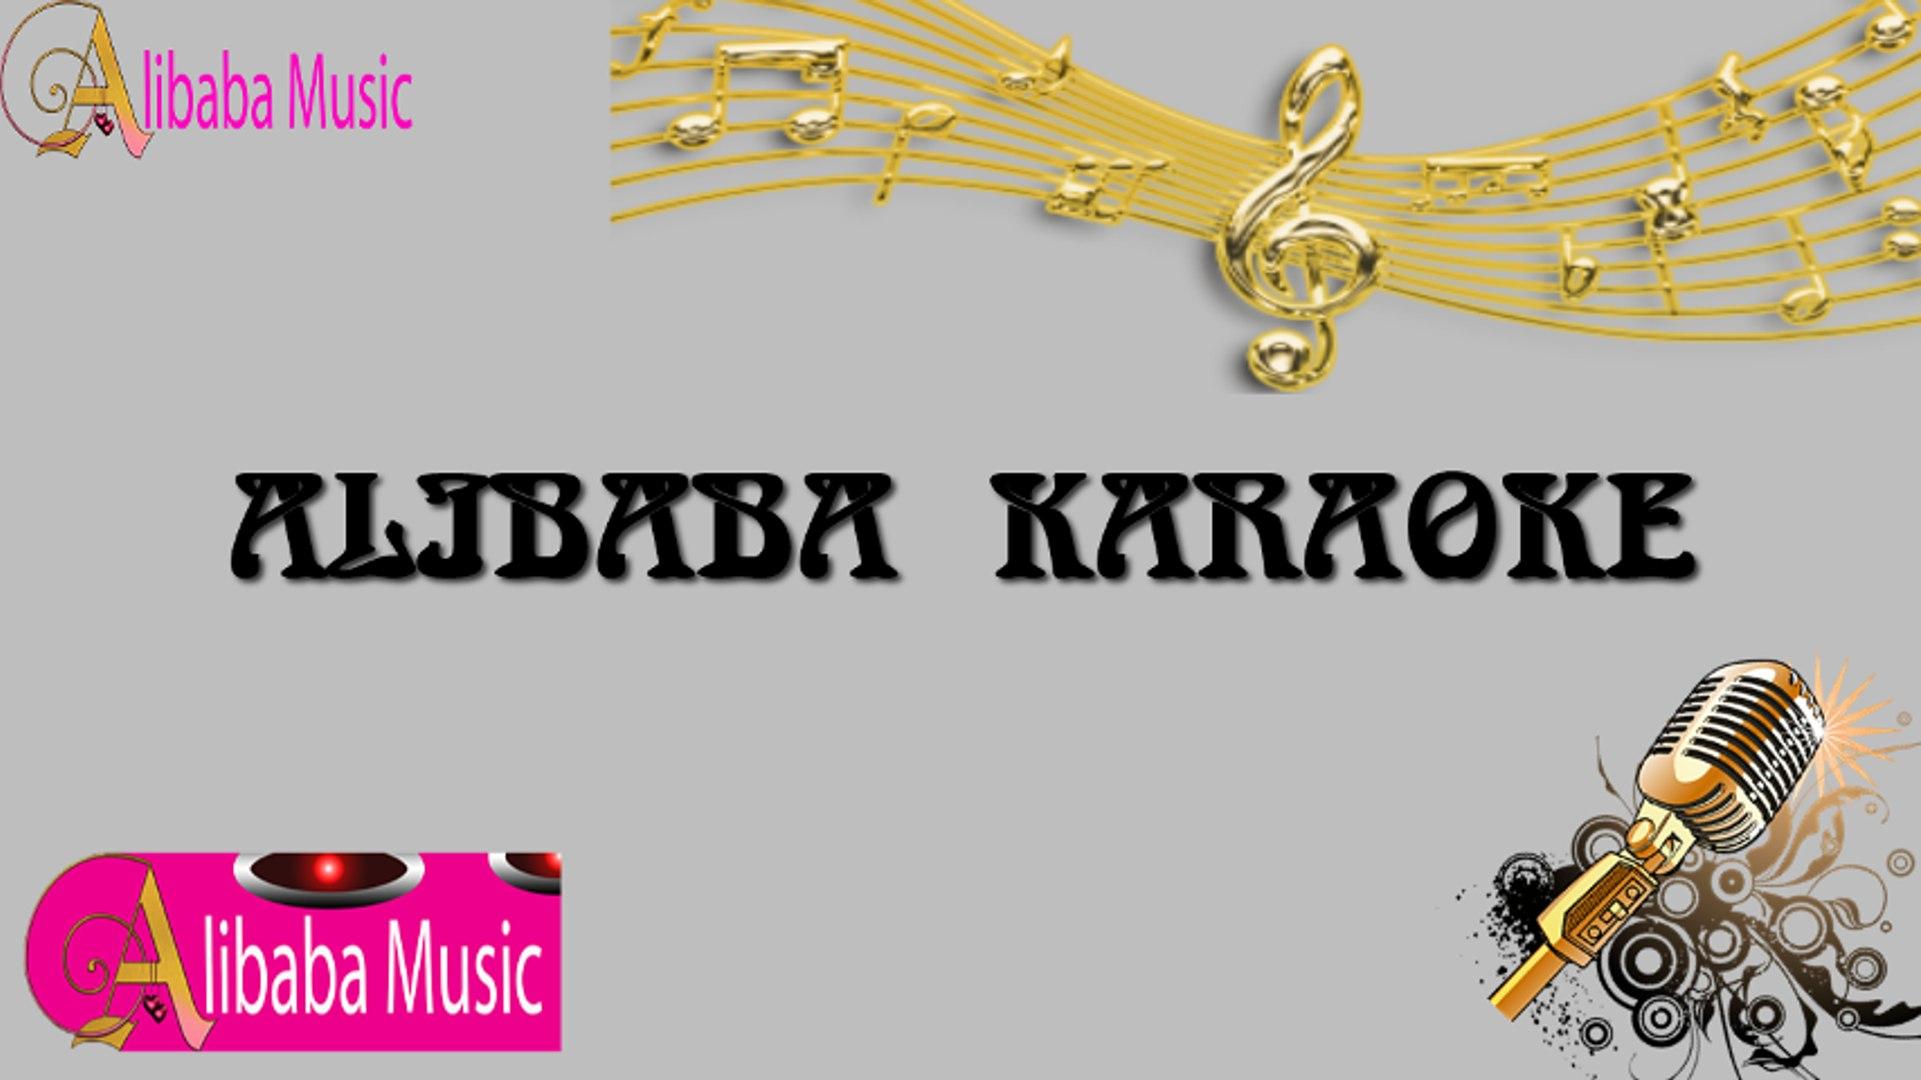 And I Love You So - Elvis Presley - Alibaba Karaoke